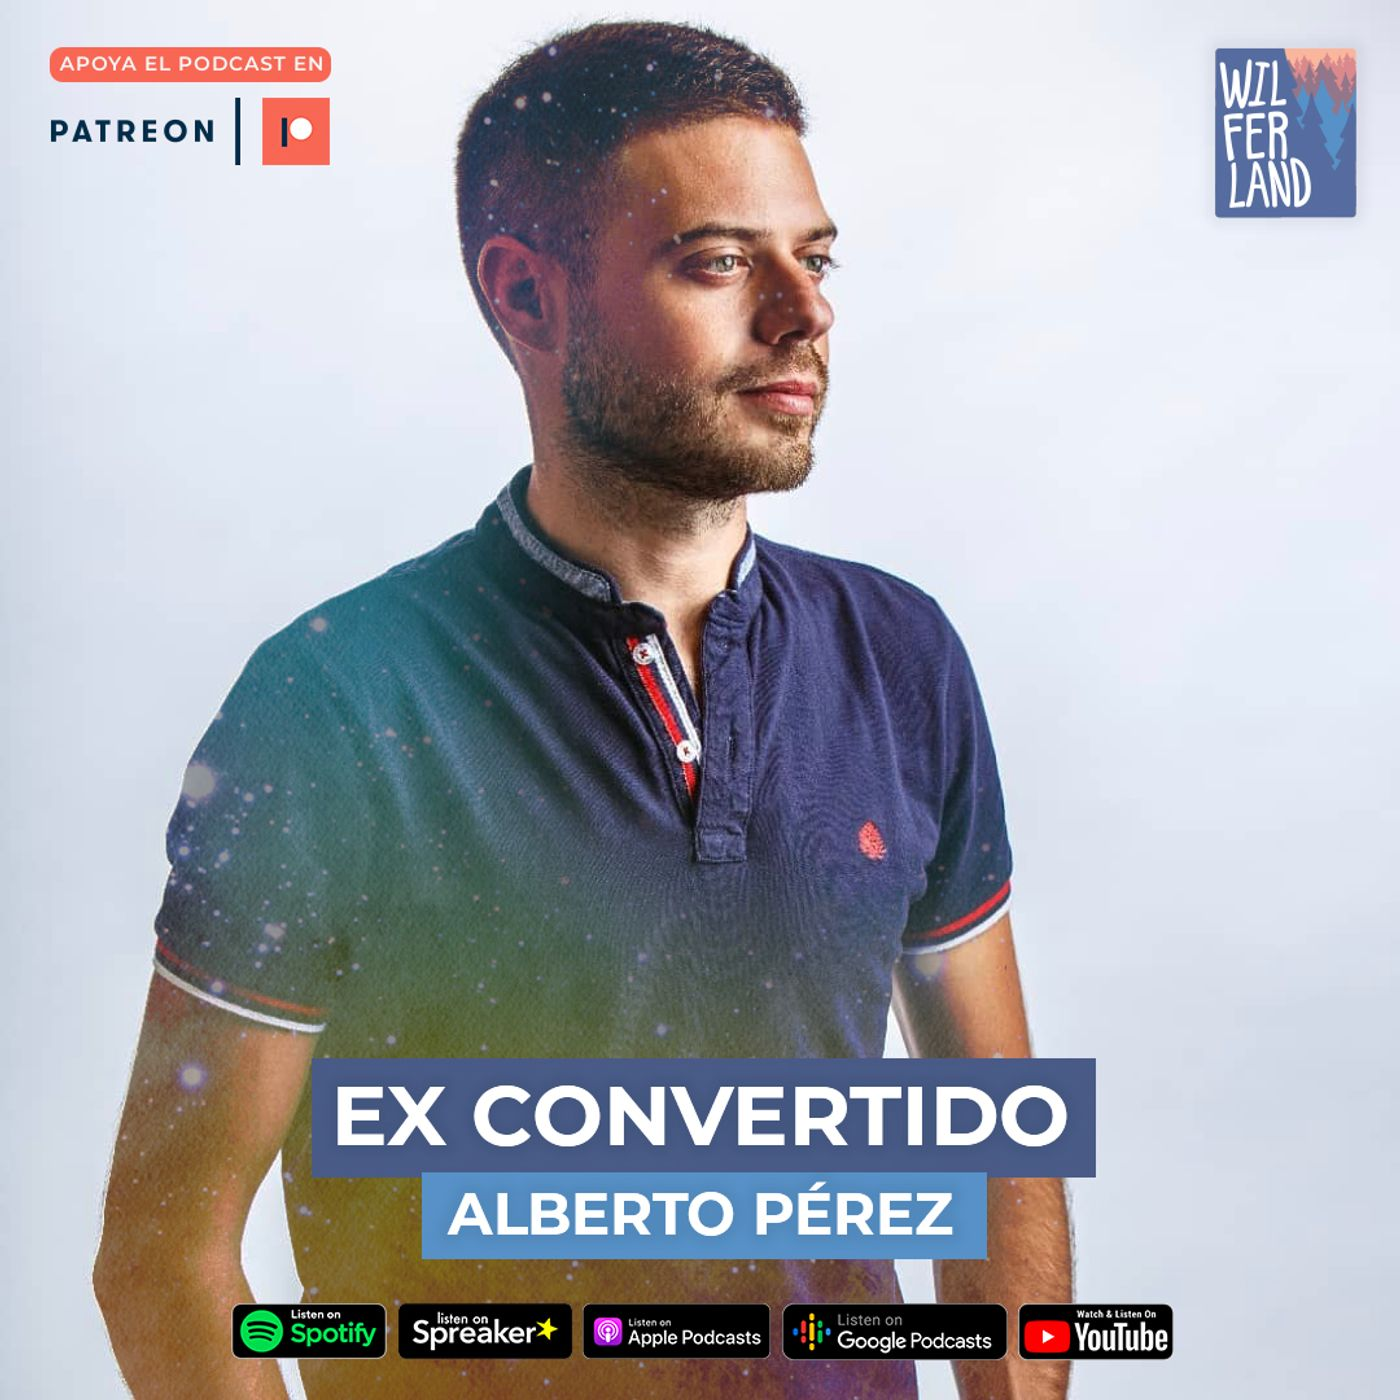 EX CONVERTIDO